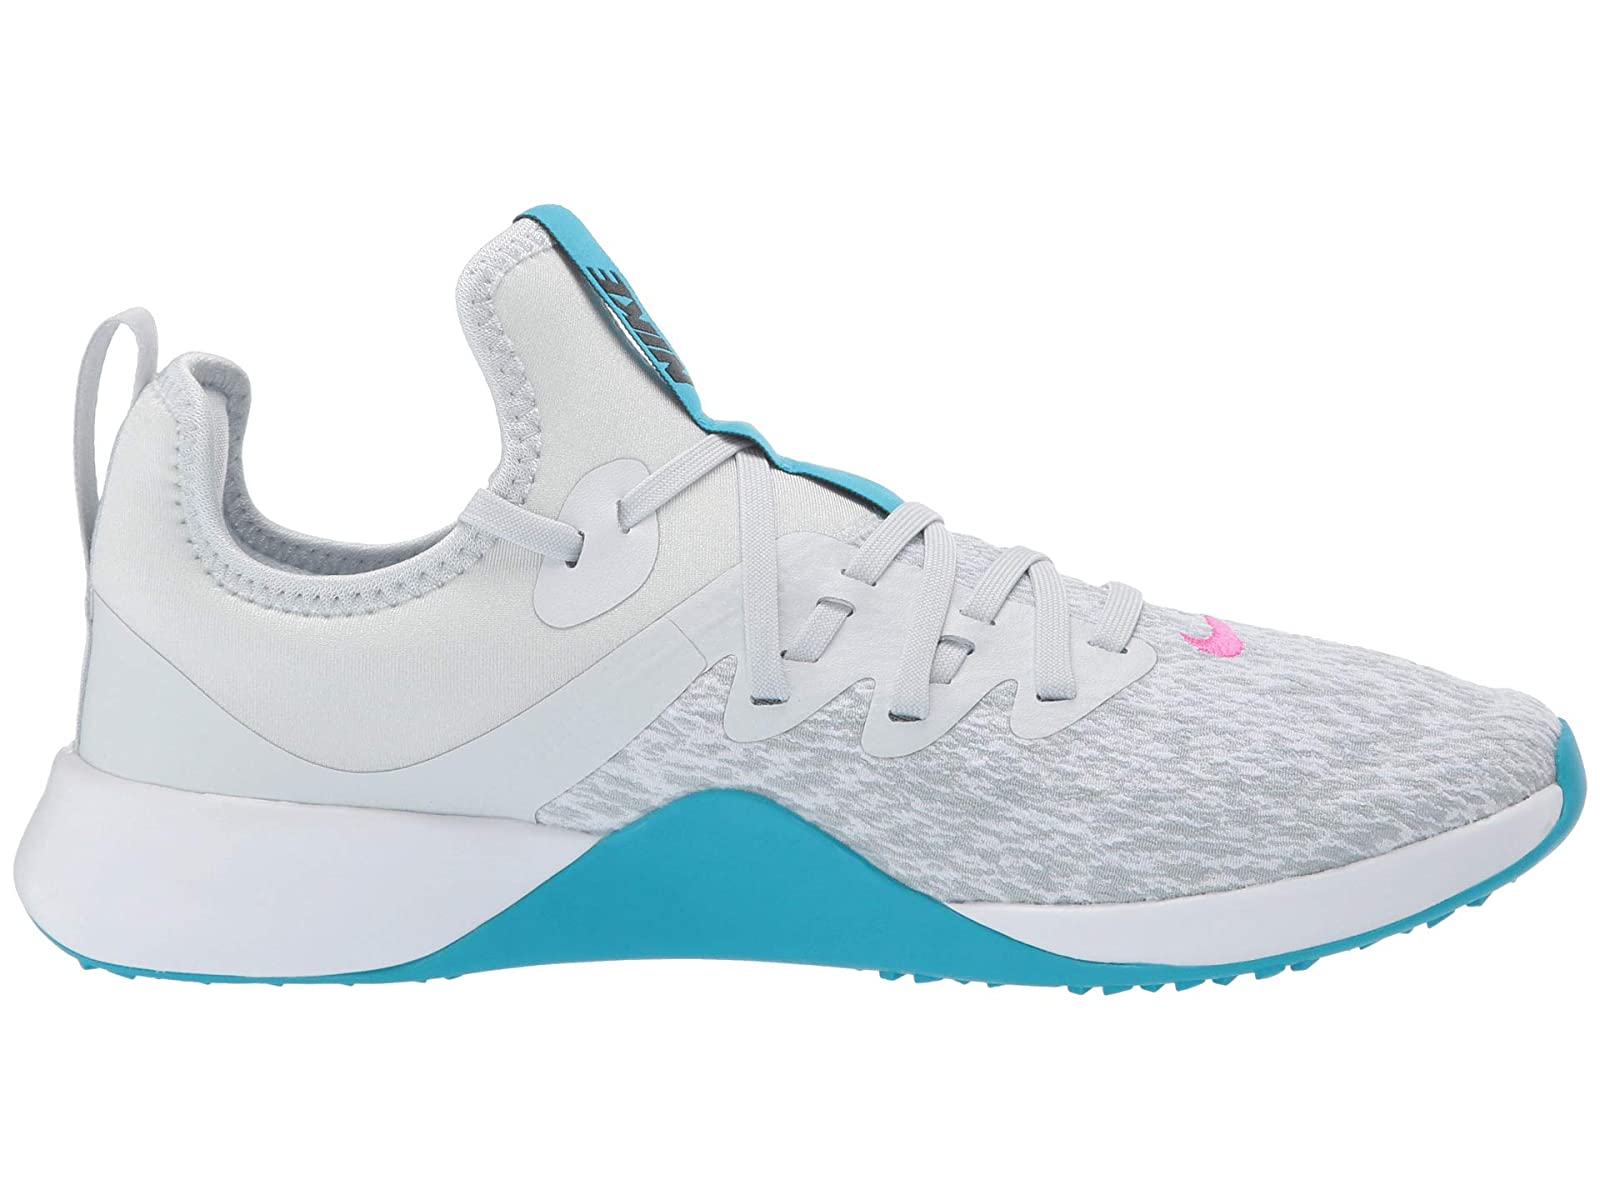 c5ba3e667d6a6 Details about Woman's Sneakers & Athletic Shoes Nike Foundation Elite TR